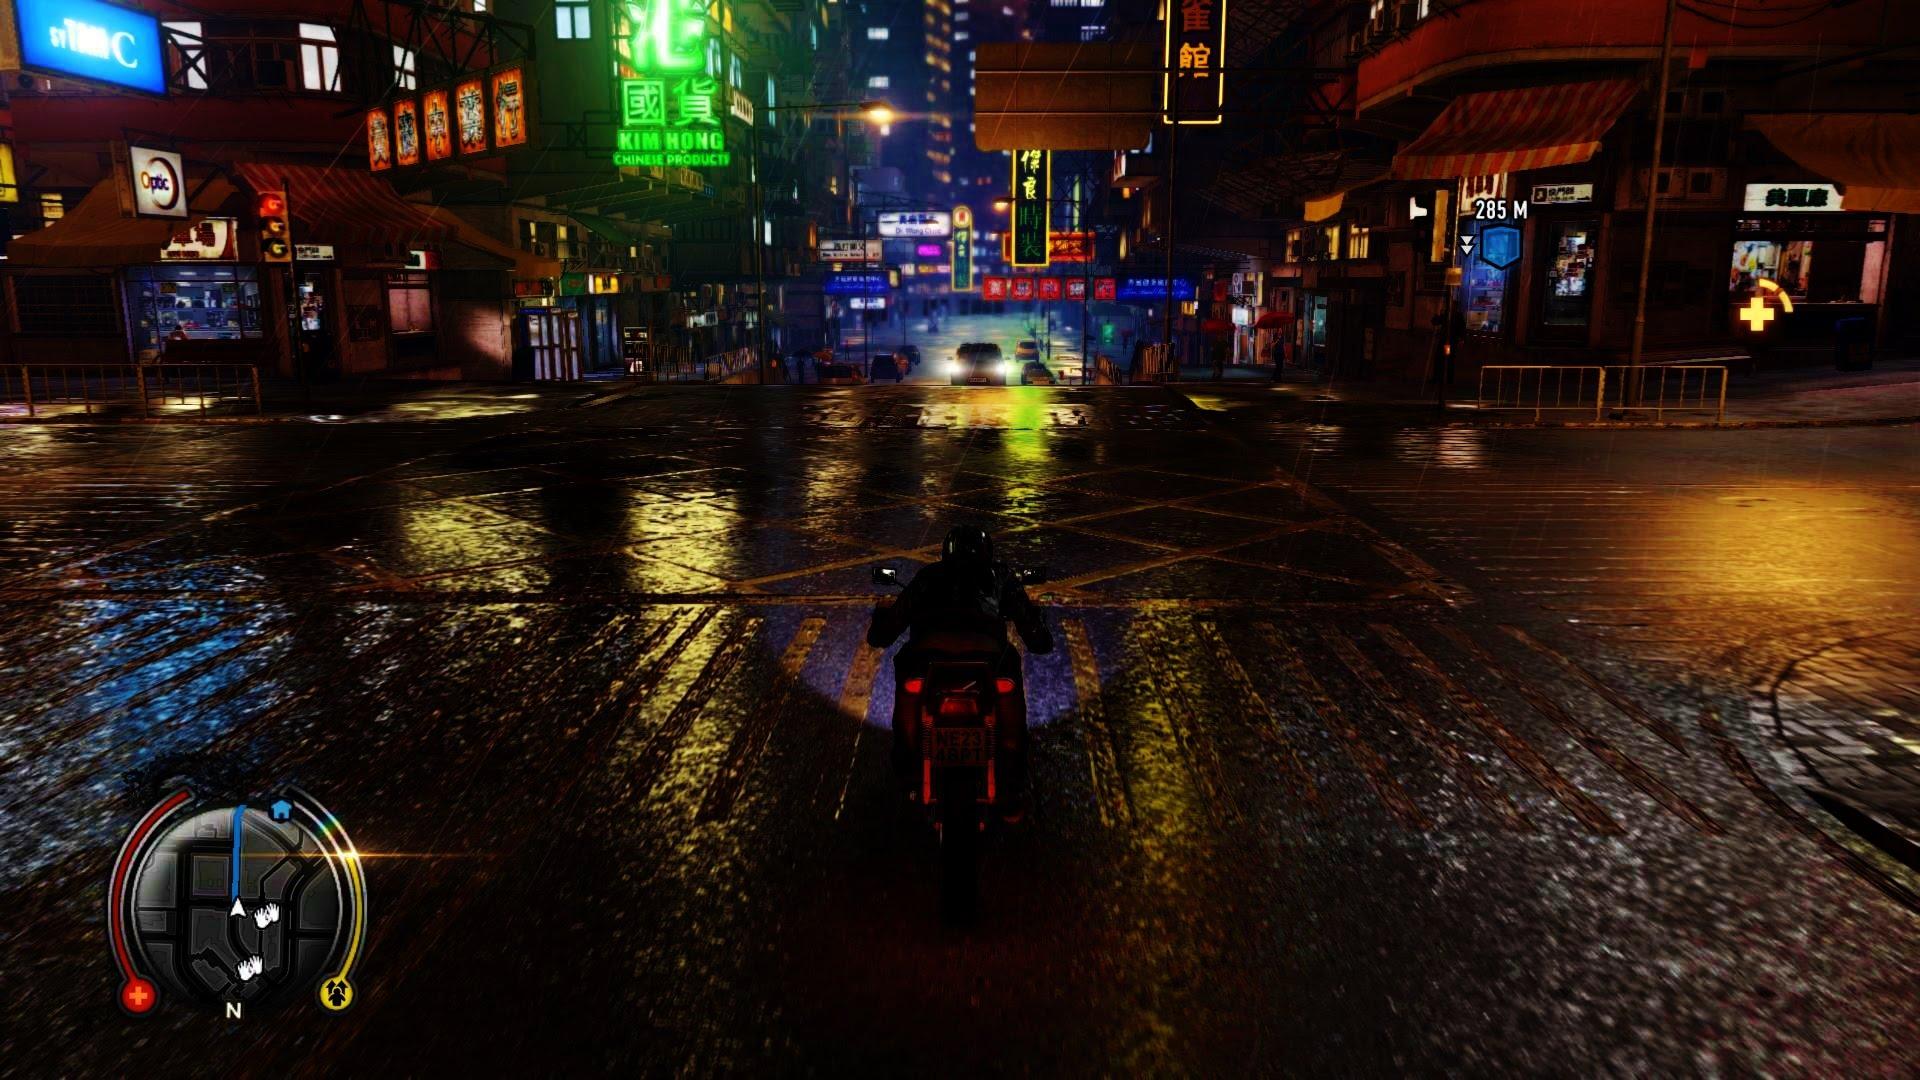 Скриншот  6 - Sleeping Dogs: Definitive Edition Steam Key RU/CIS